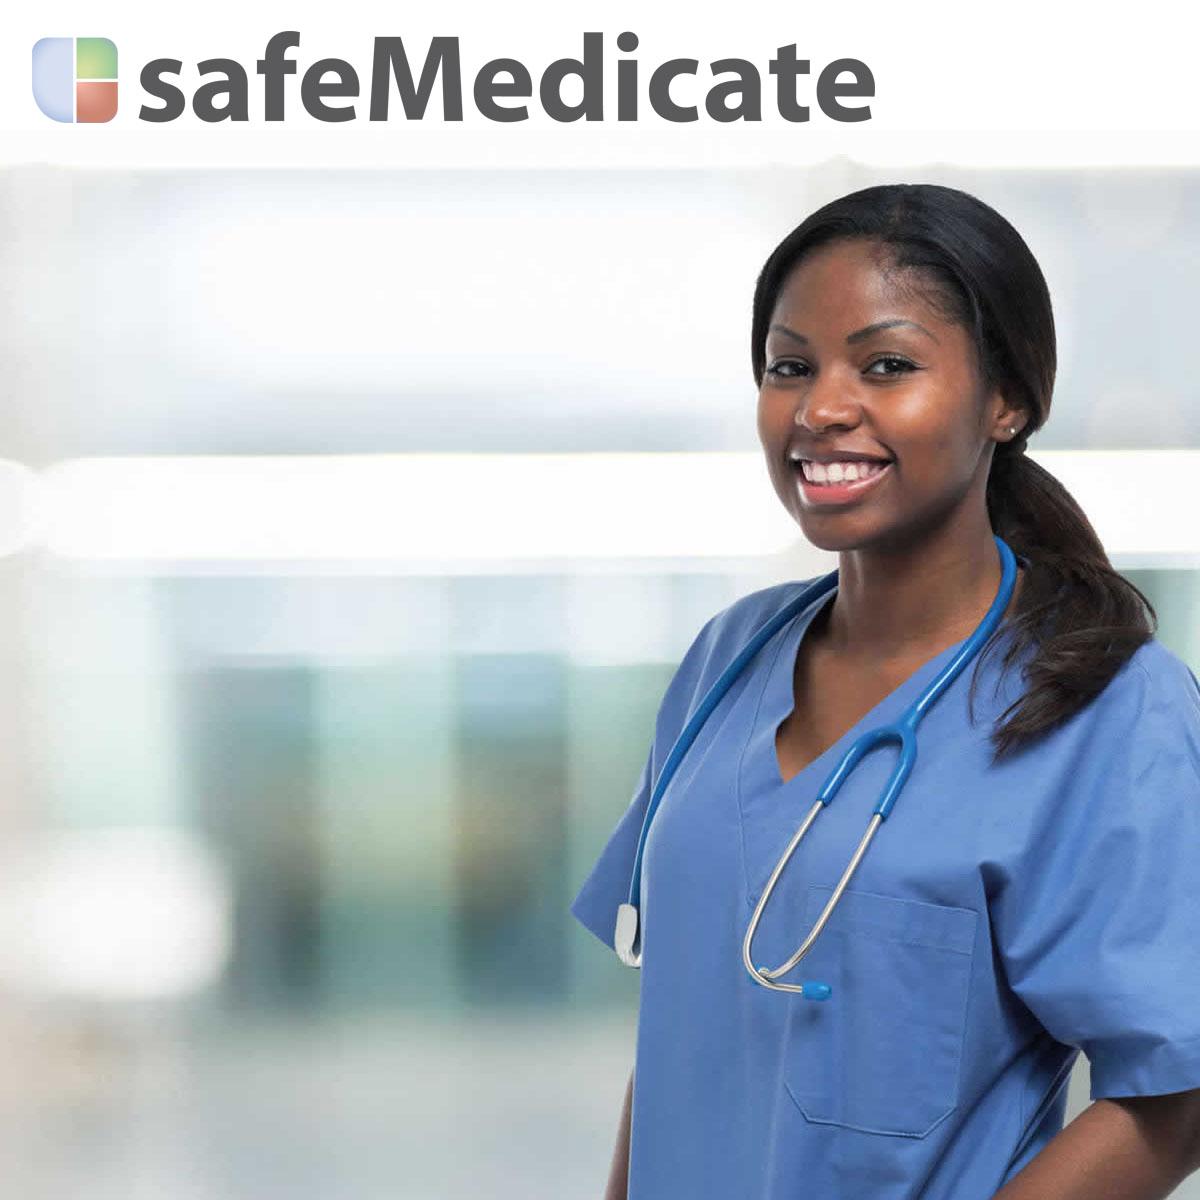 safeMedicate   Drug calculation competence development